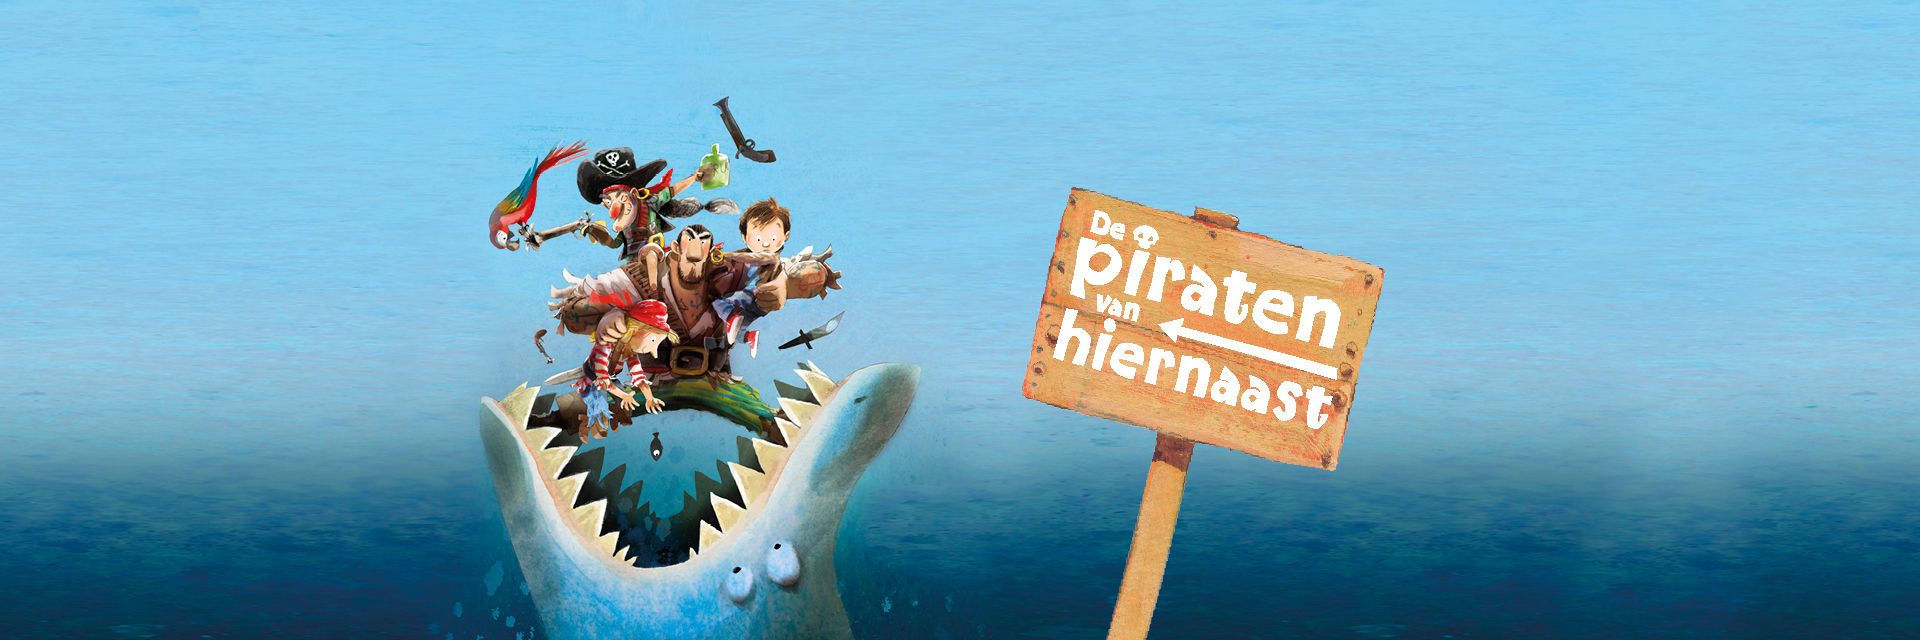 Piraten van hiernaast - Reggie Naus - Mark Janssen